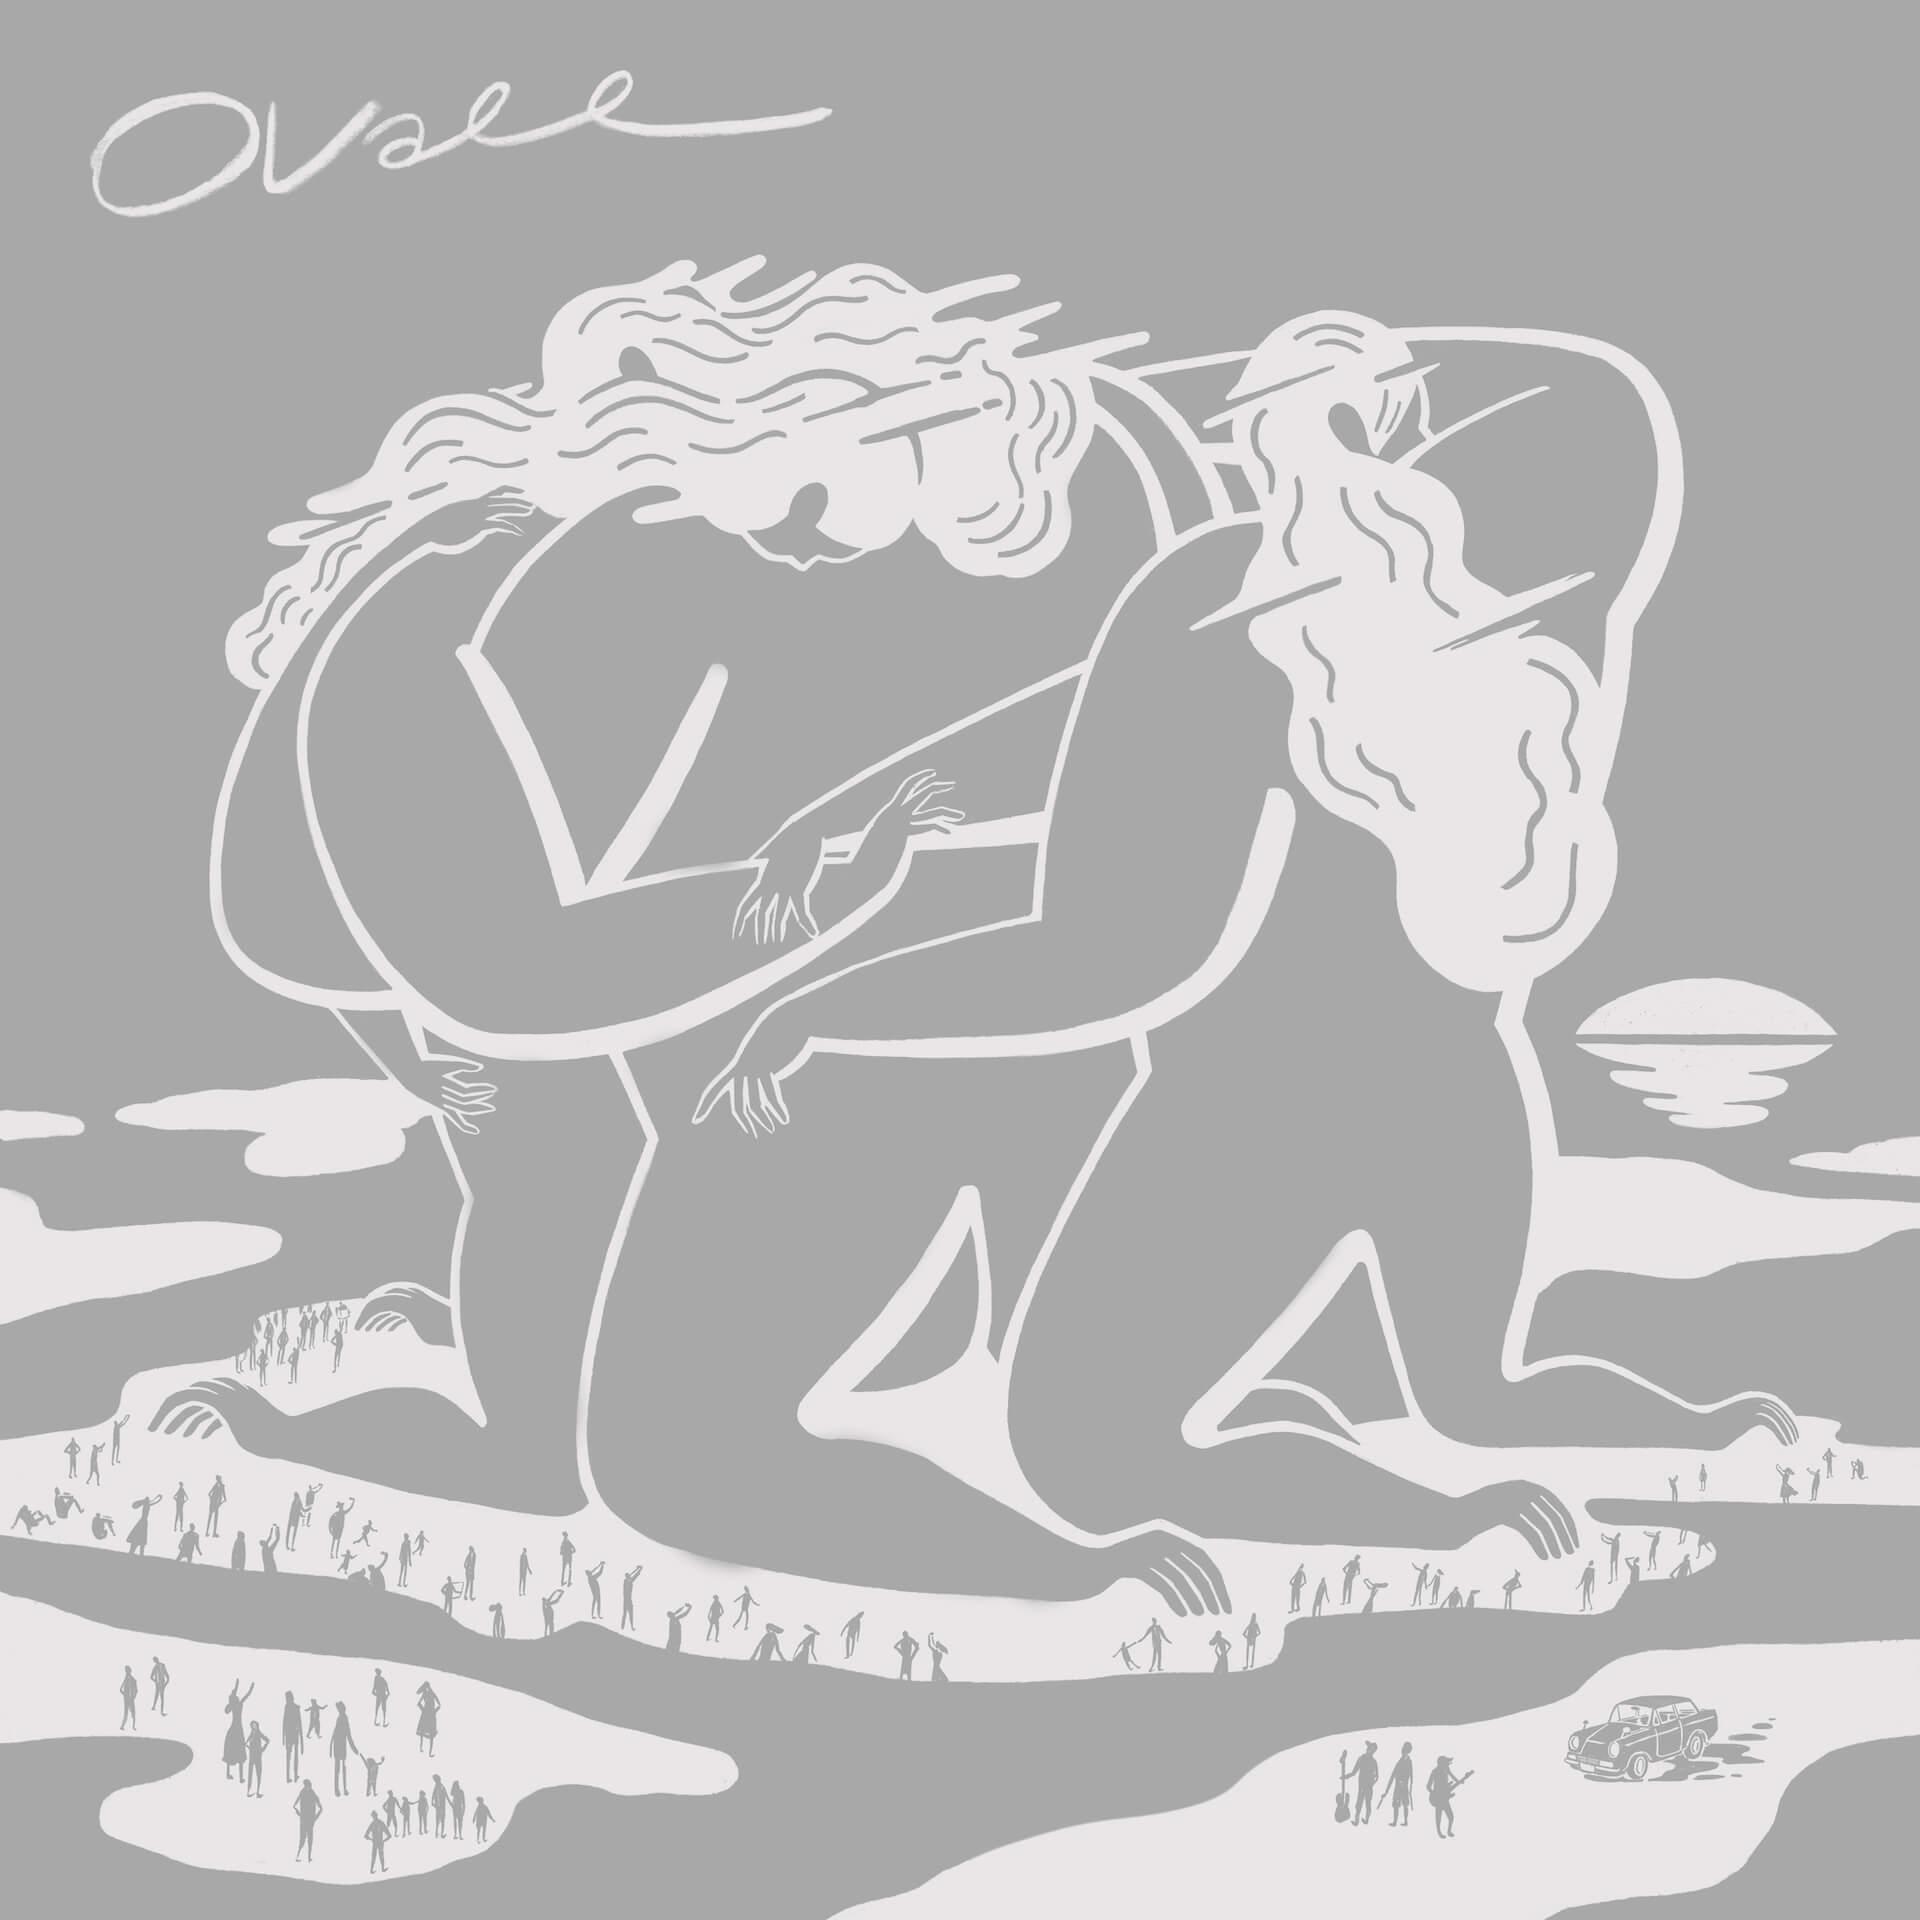 Ovallの3rdアルバム『Ovall』のRework盤がリリース!WONKメンバー、Kan Sano、Michael Kaneko、Nenashiが参加 music200502_ovall_1